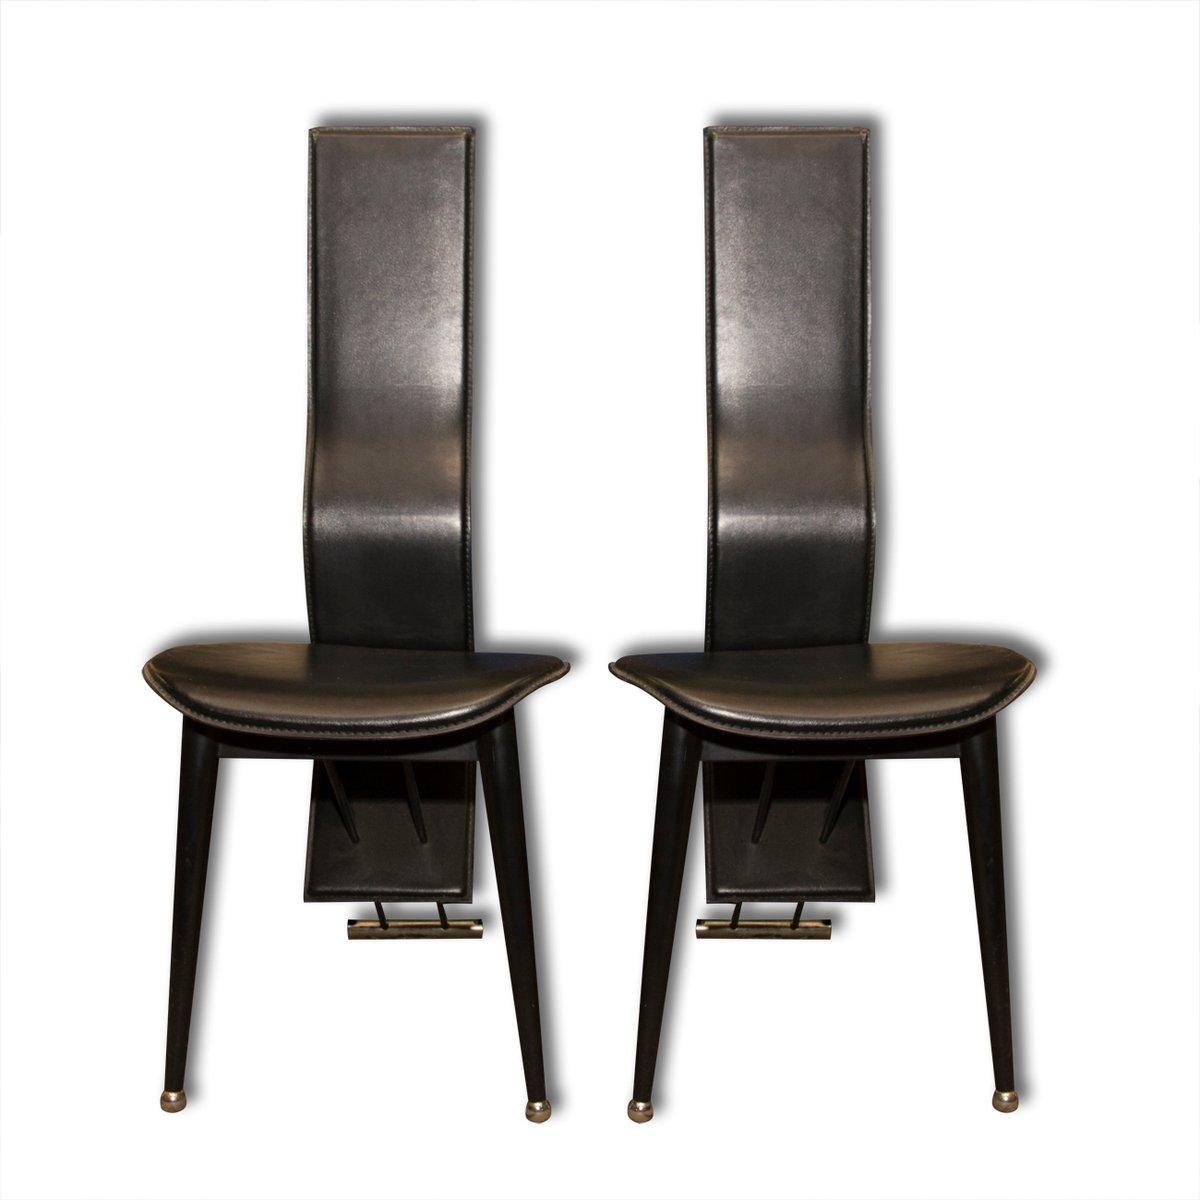 Sedie In Pelle Pranzo ~ bukadar.info = galleria di sedie foto e le ...